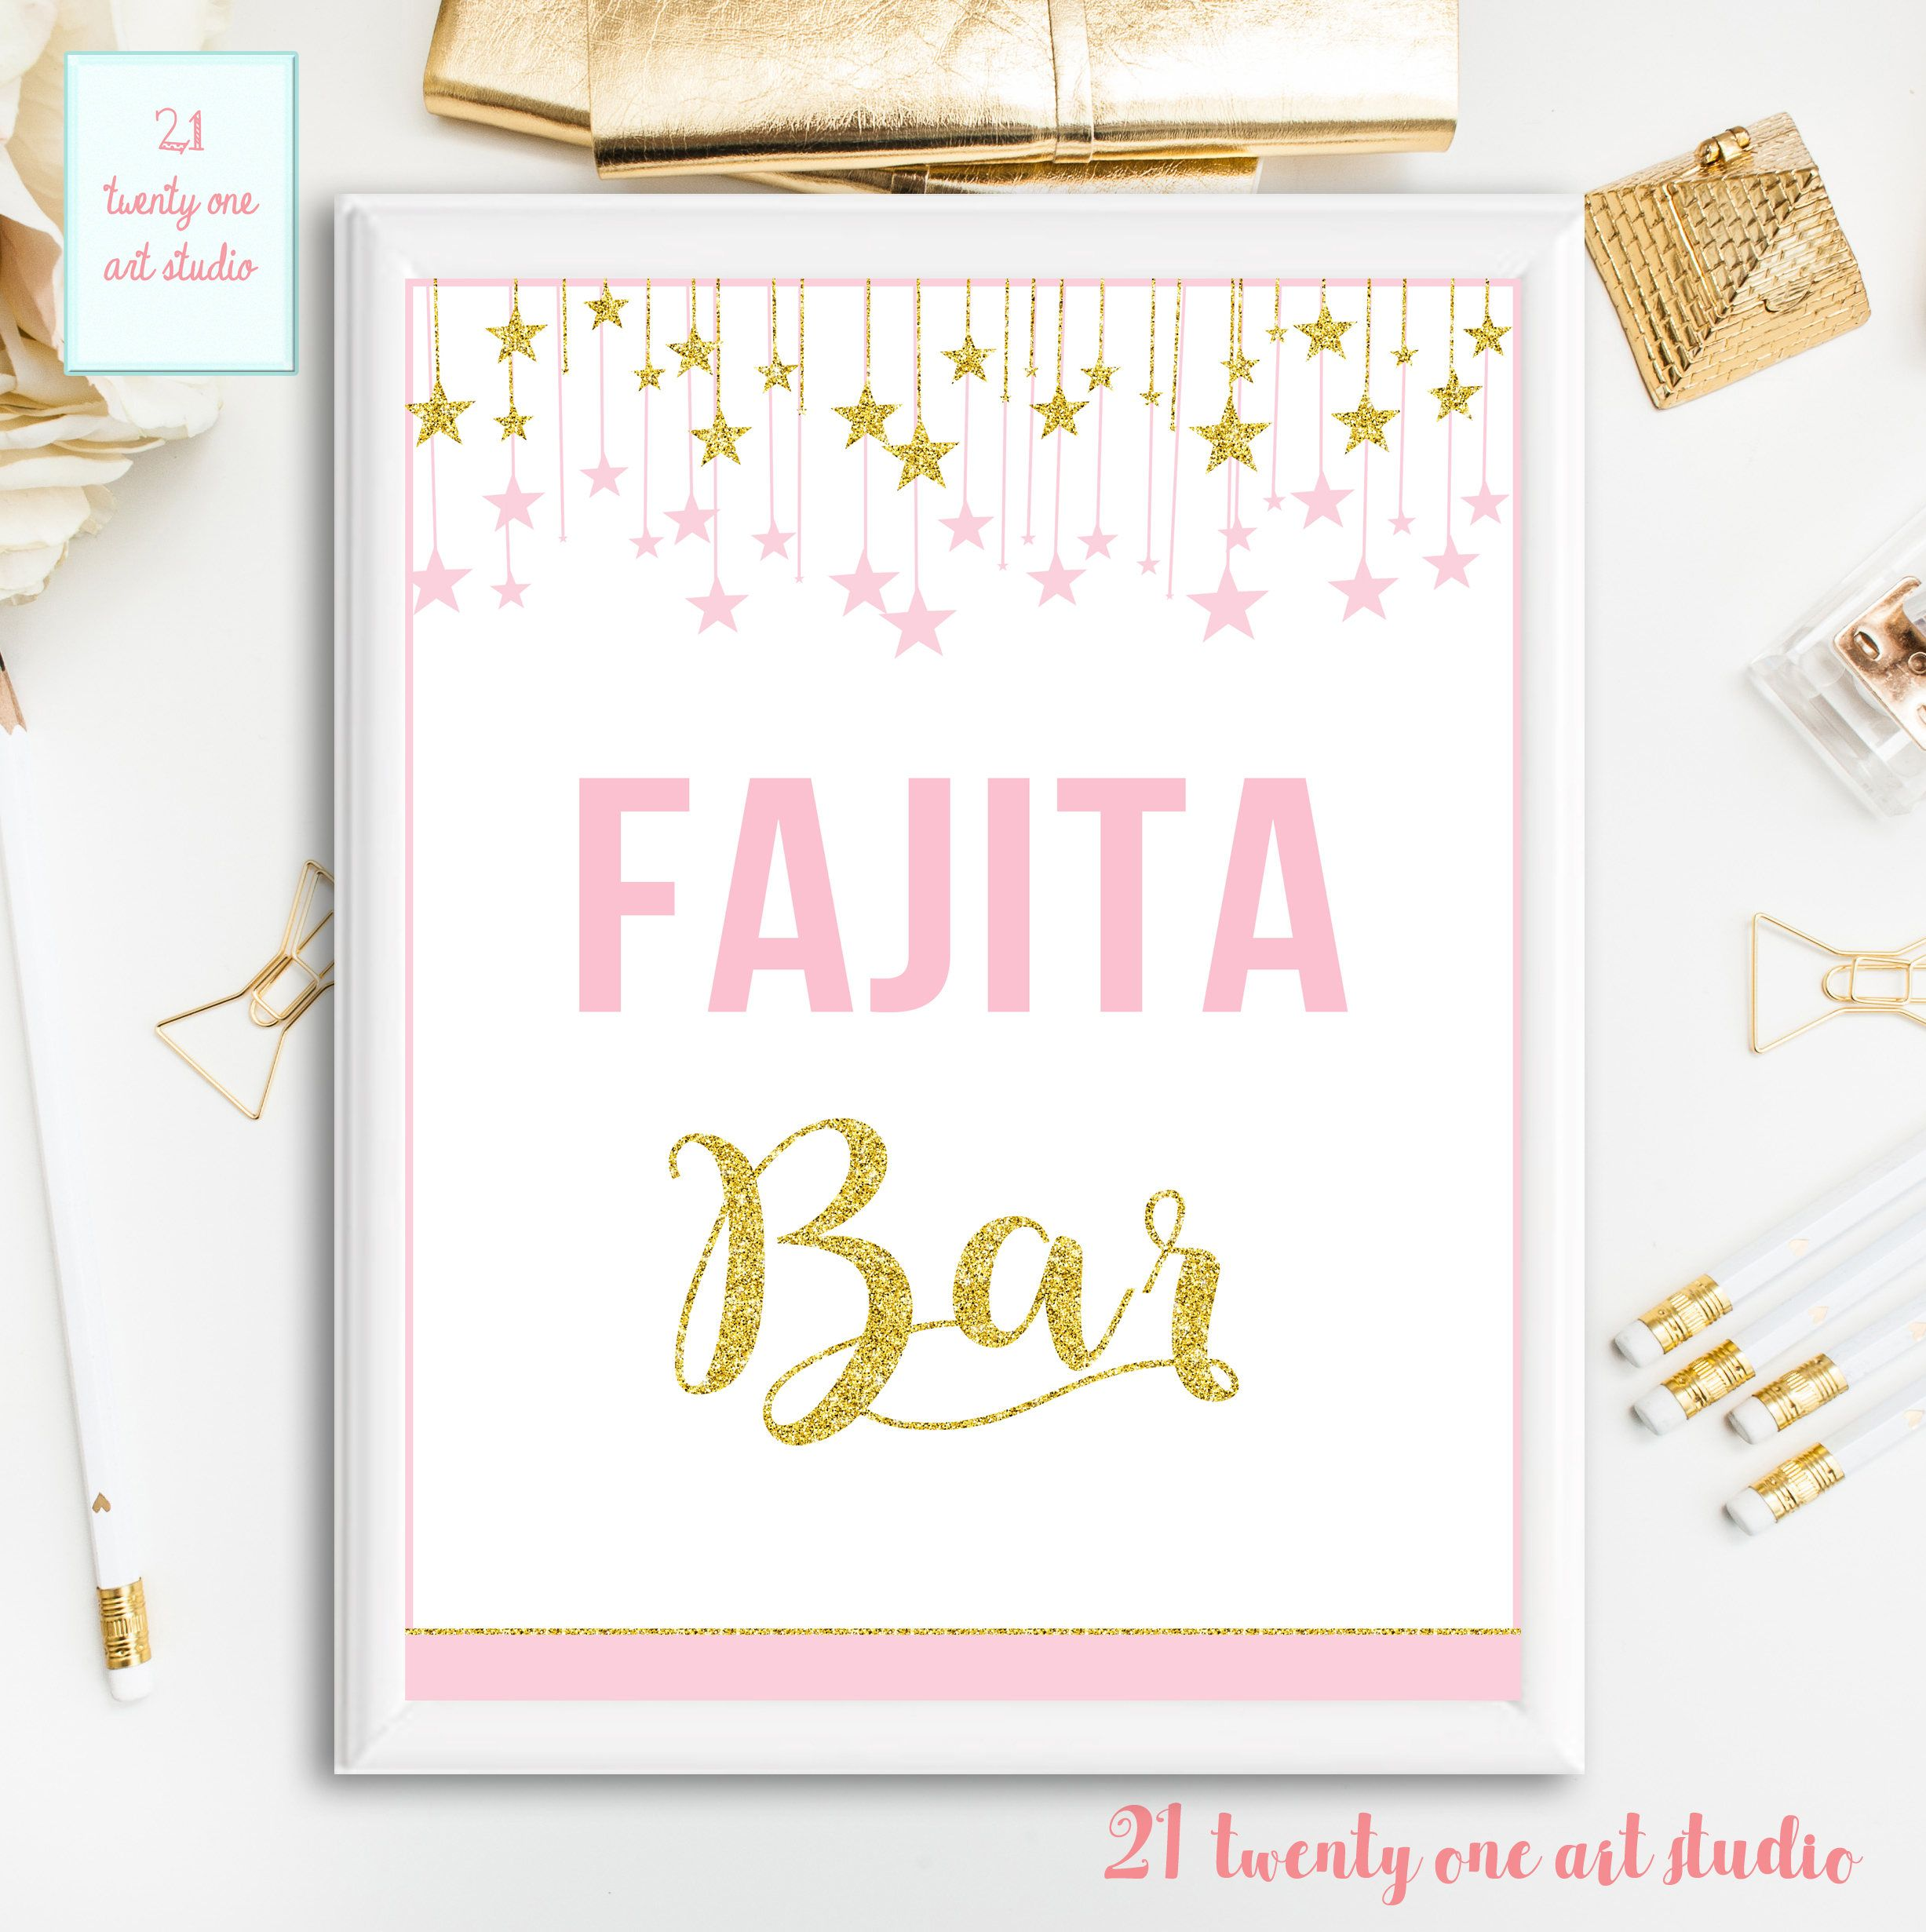 Twinkle Twinkle Little Star Sign, Fajita Bar Birthday Sign, Pink